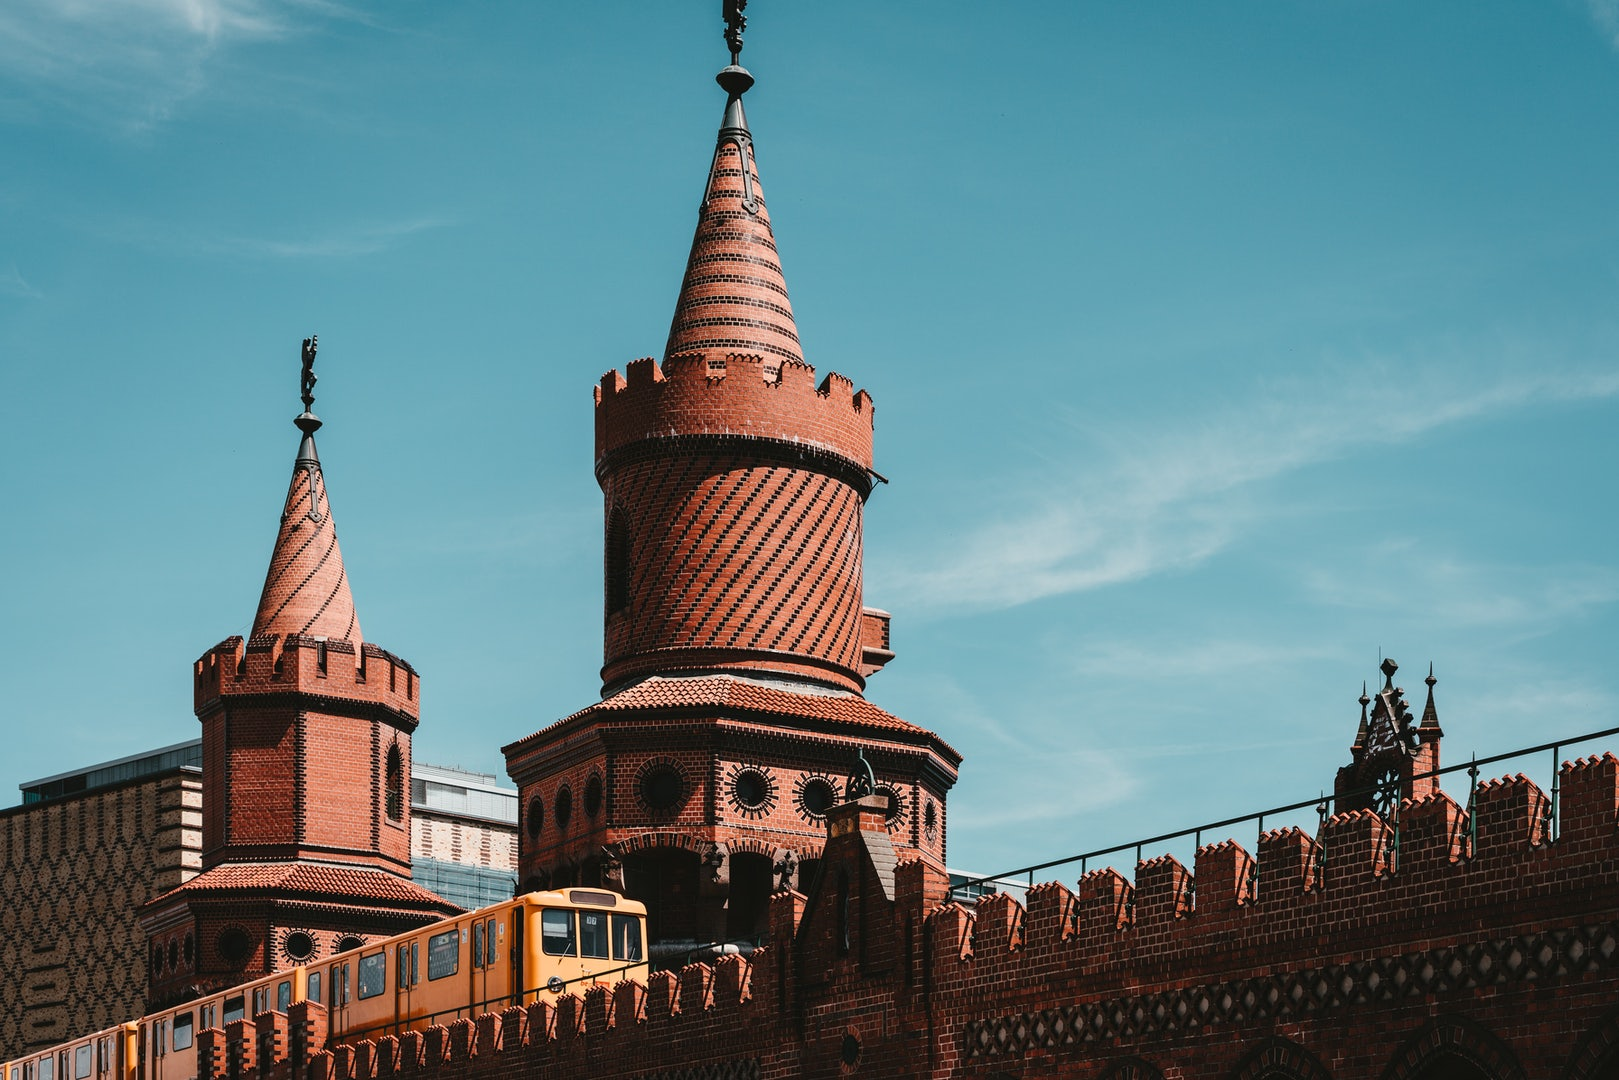 towers of the Berlin Oberbaumbridge